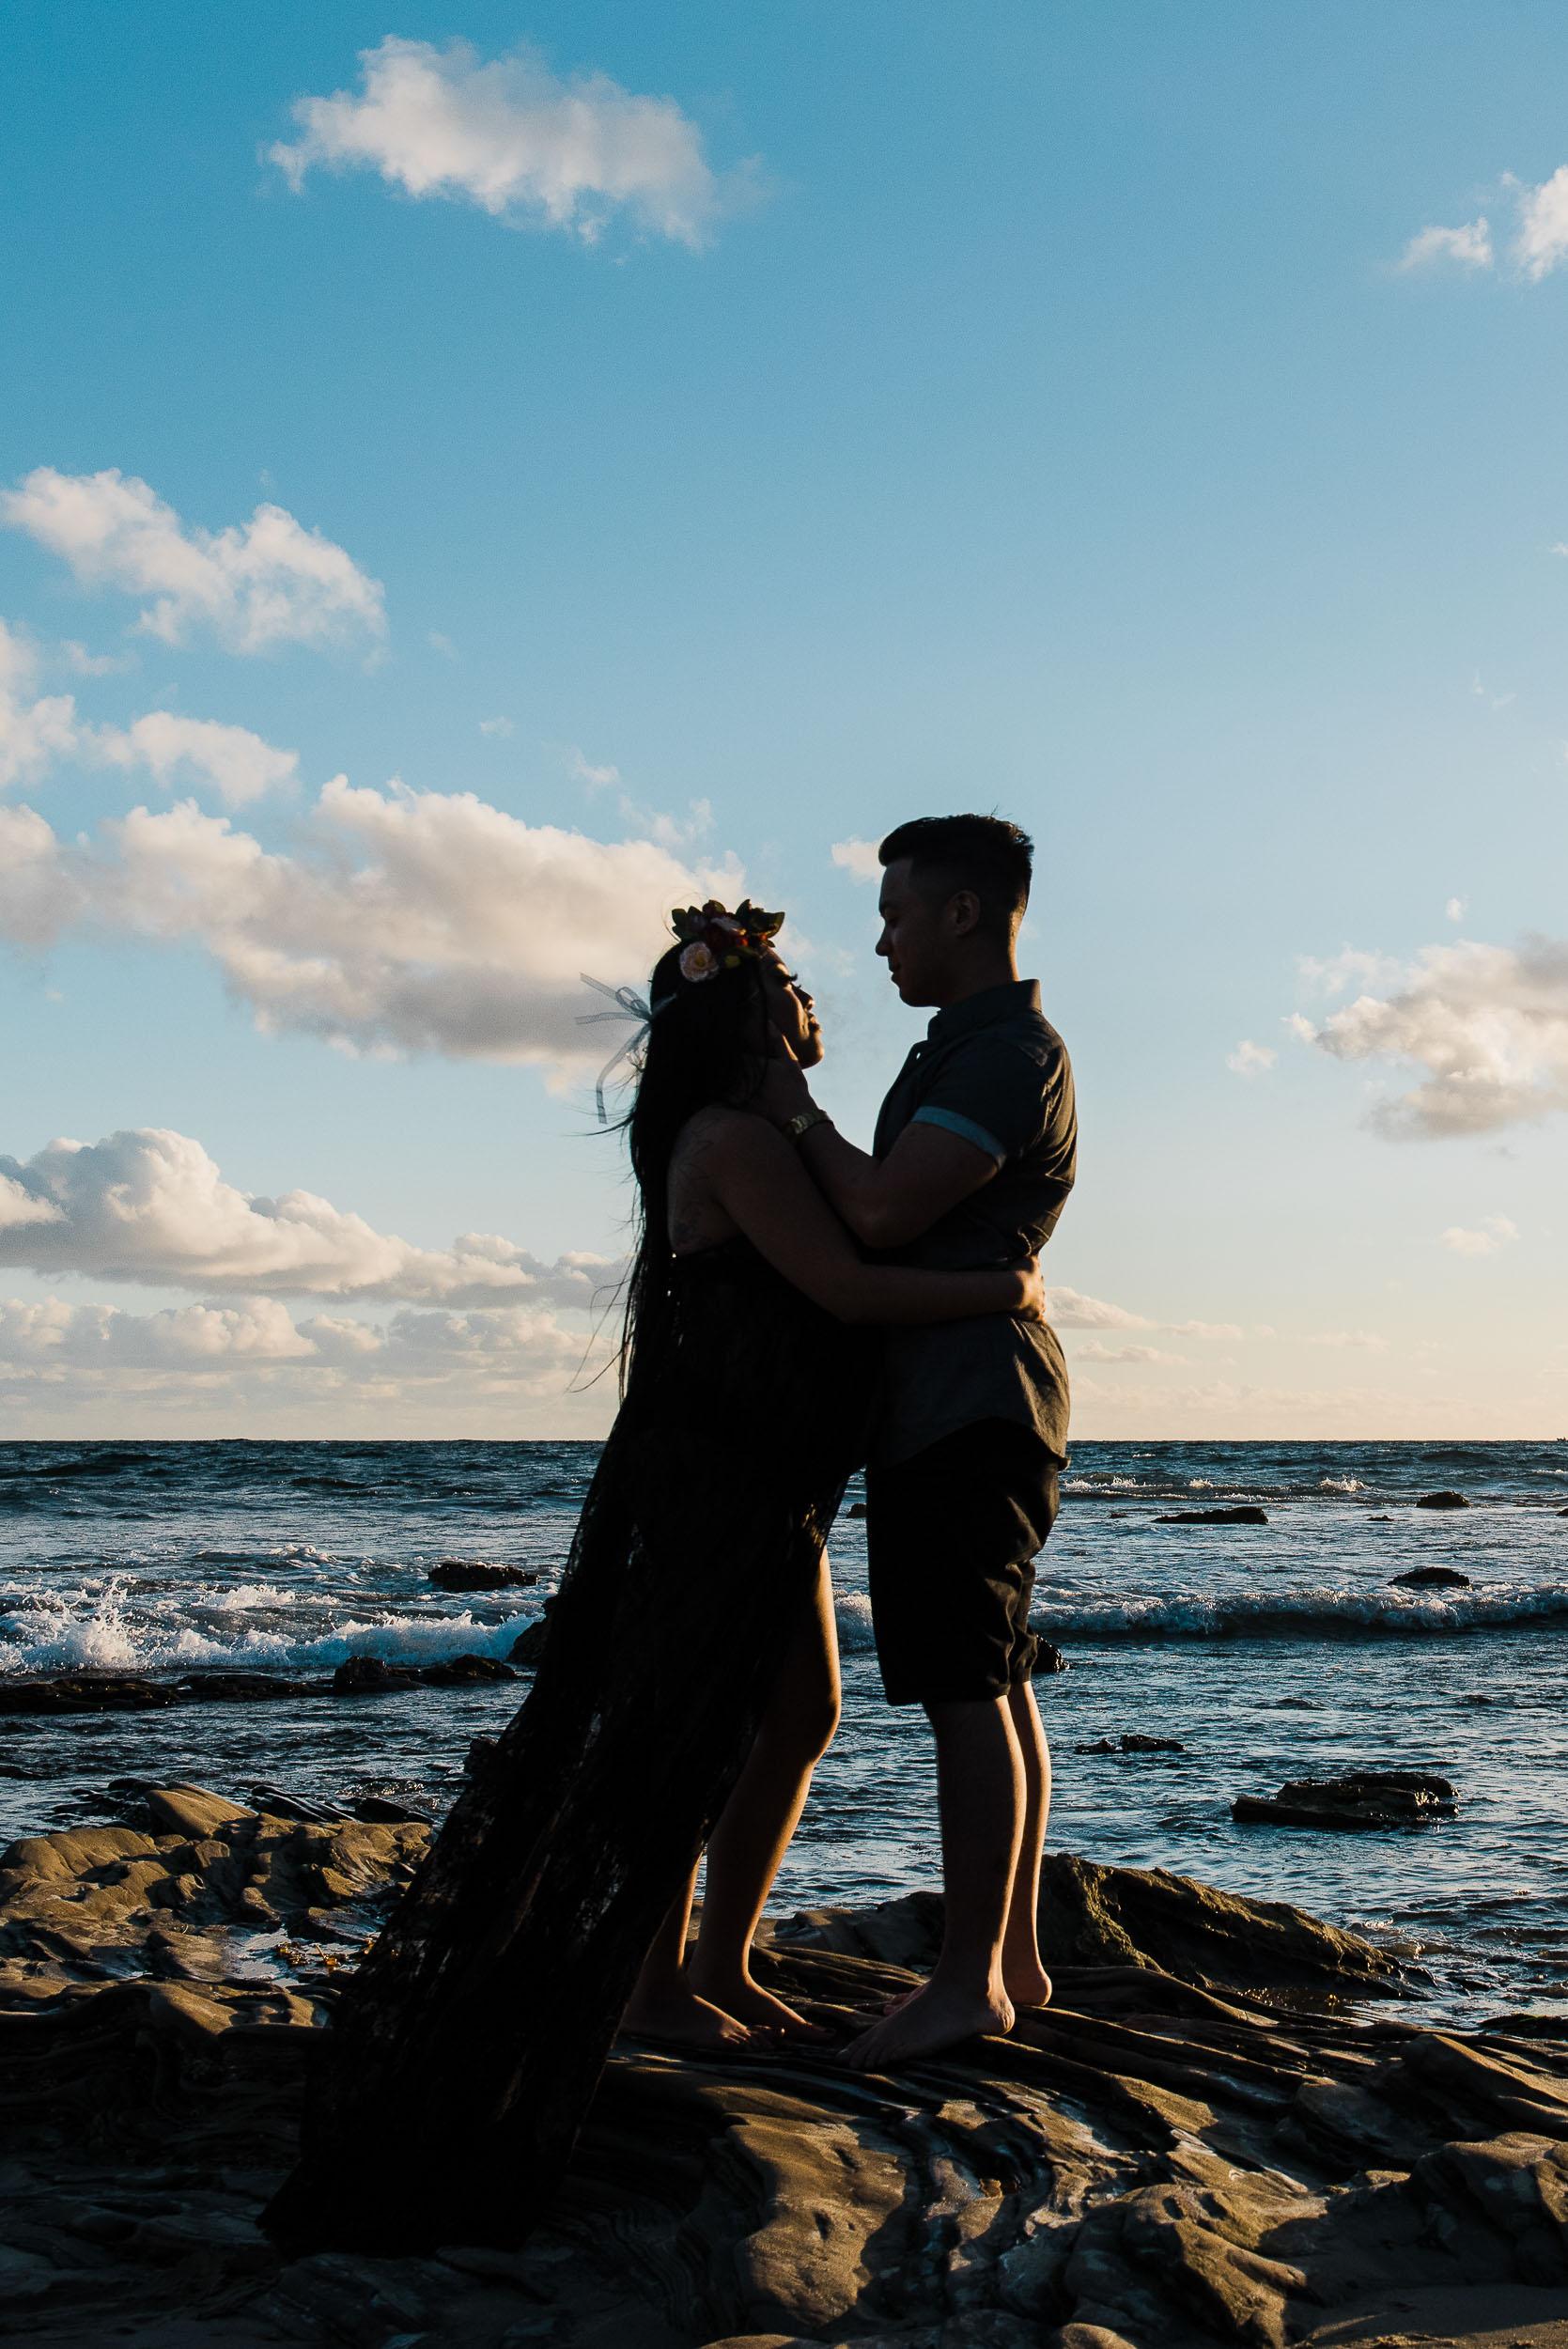 Miraflor-Photo-Peter-Crystal-Maternity-Photoshoot-Newport-Beach-20180317-054.jpg